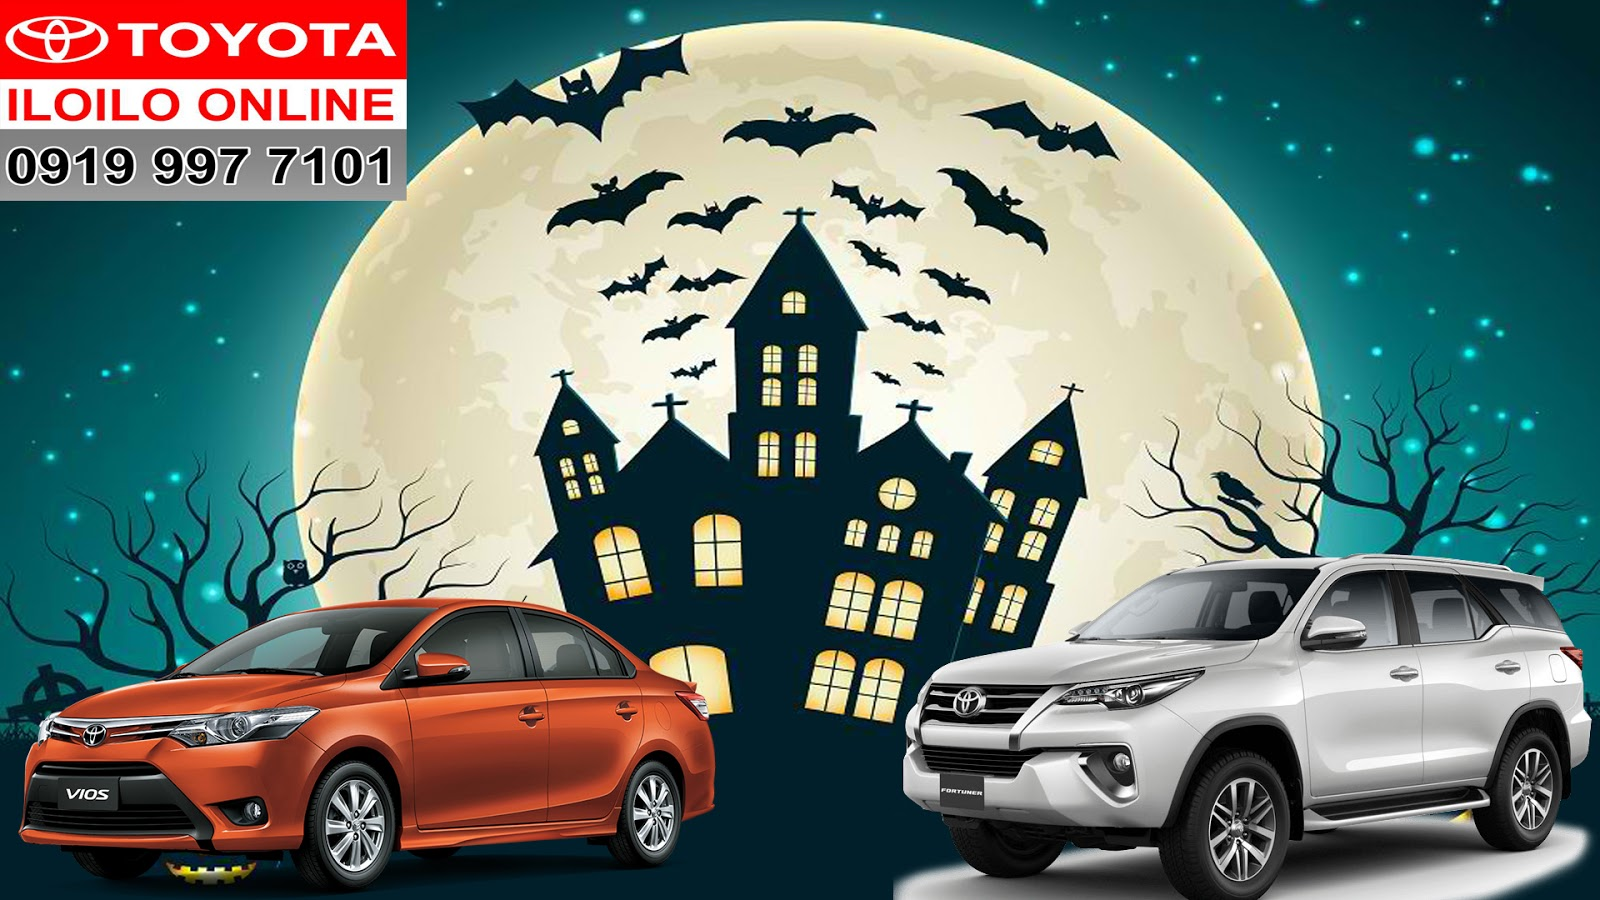 Toyota iloilo halloween deals 2016